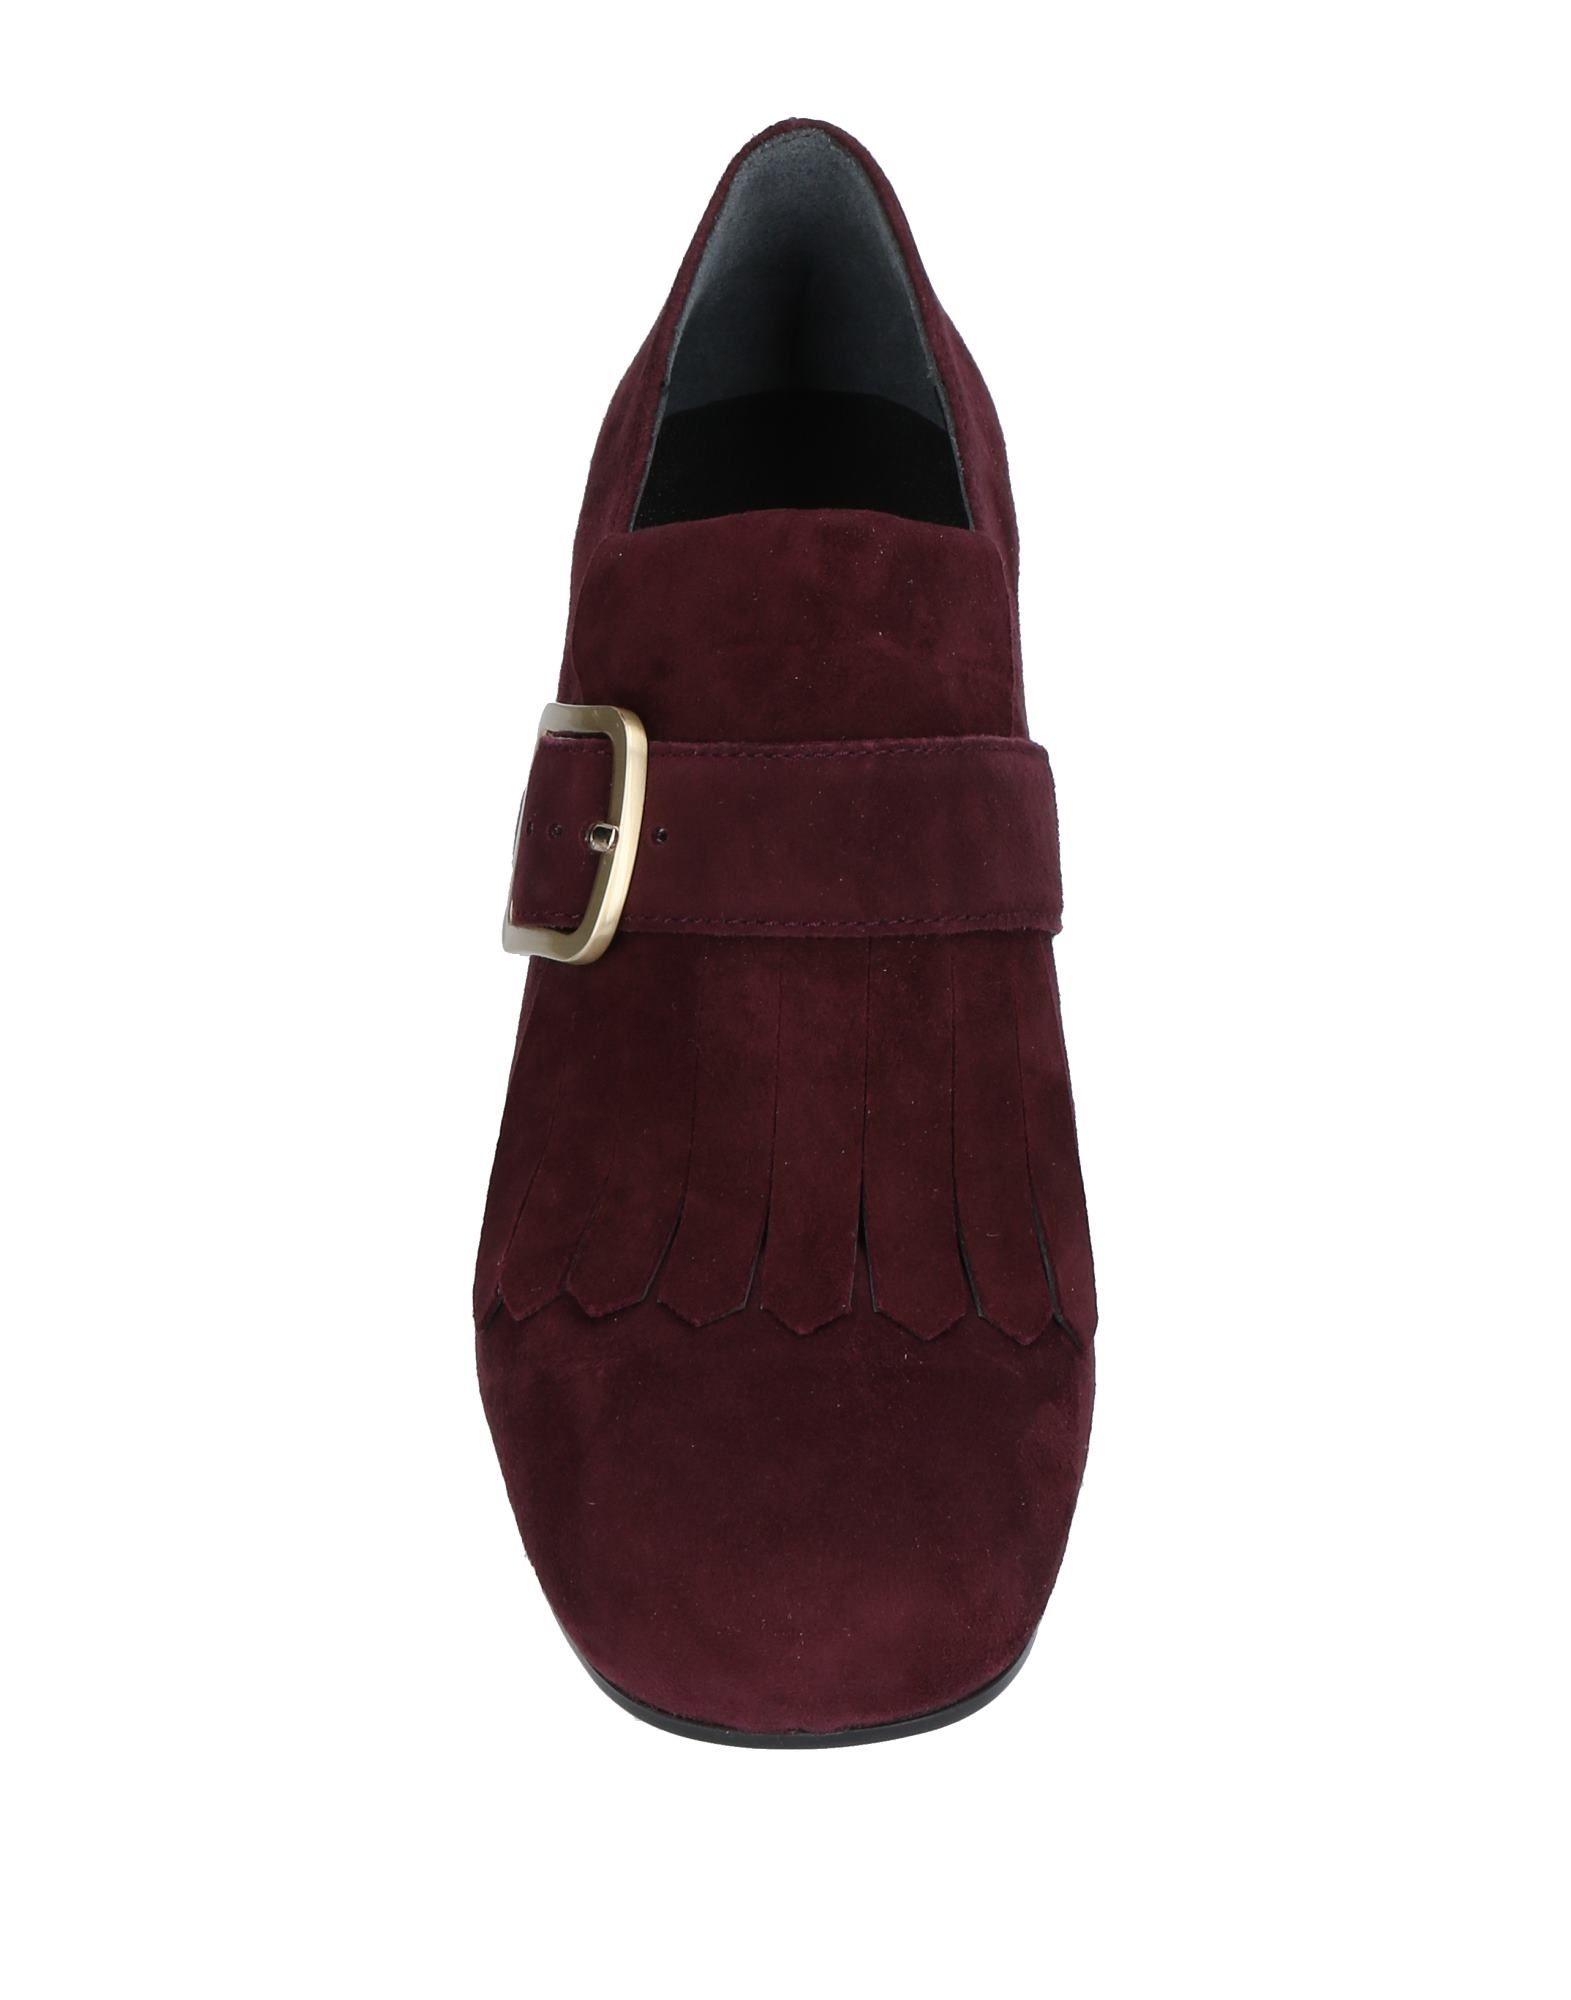 Bruno Schuhe Premi Mokassins Damen  11455846QR Gute Qualität beliebte Schuhe Bruno d7ed18